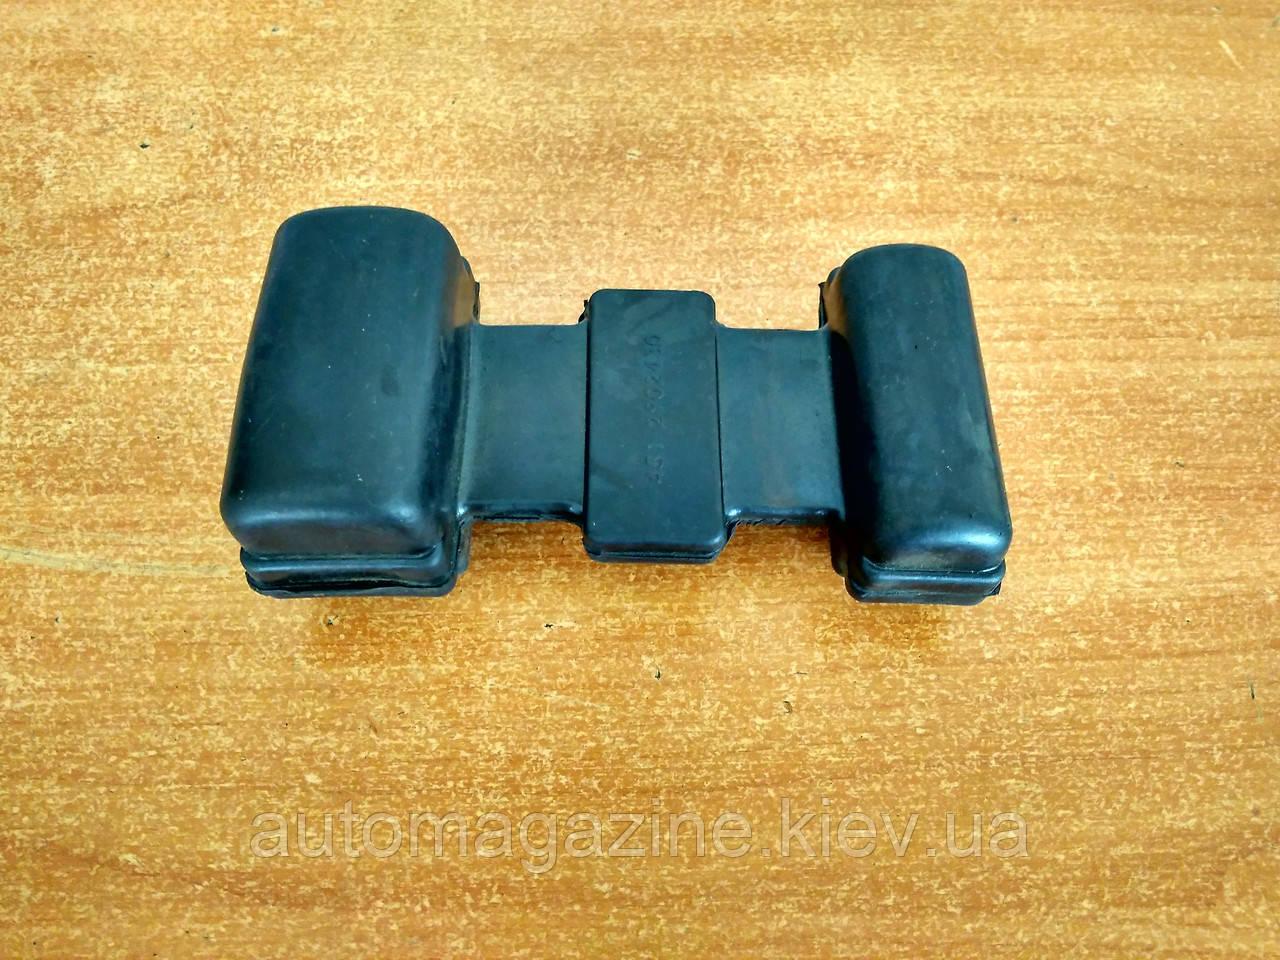 Подушка ресори УАЗ 452 (гума)